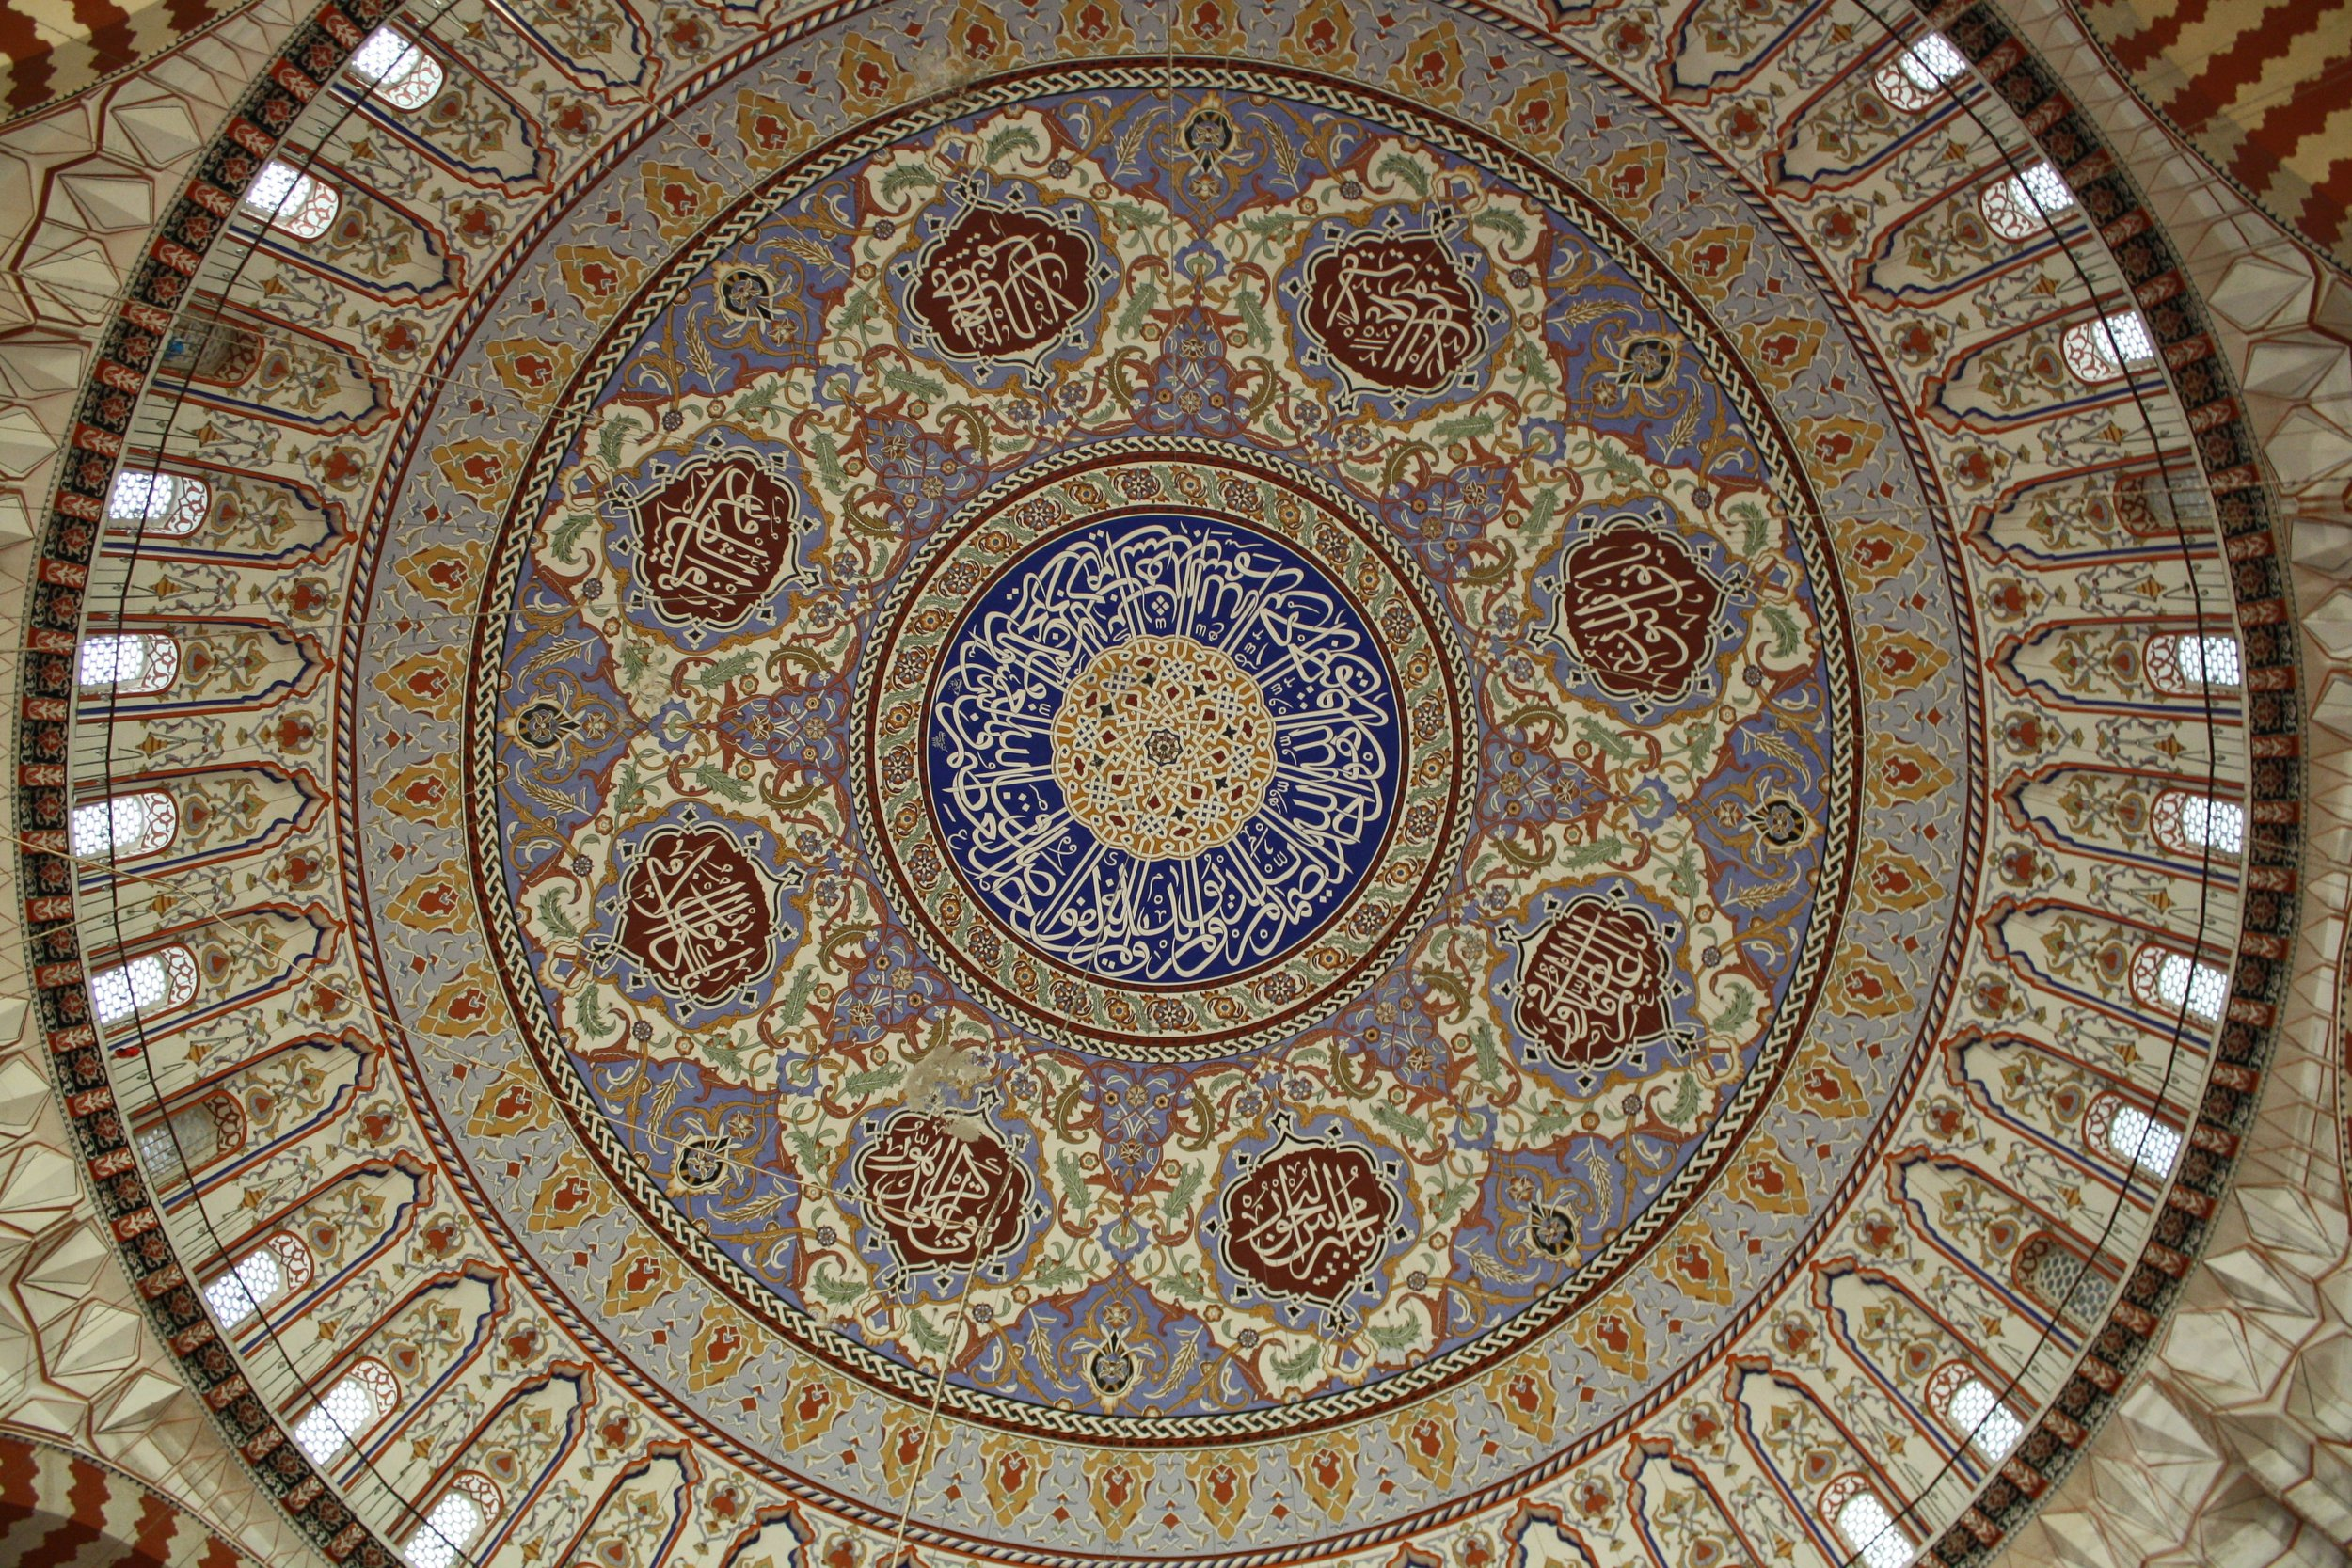 ibn-teymiyye-ibn-arabi-ihsan-senocak.jpg